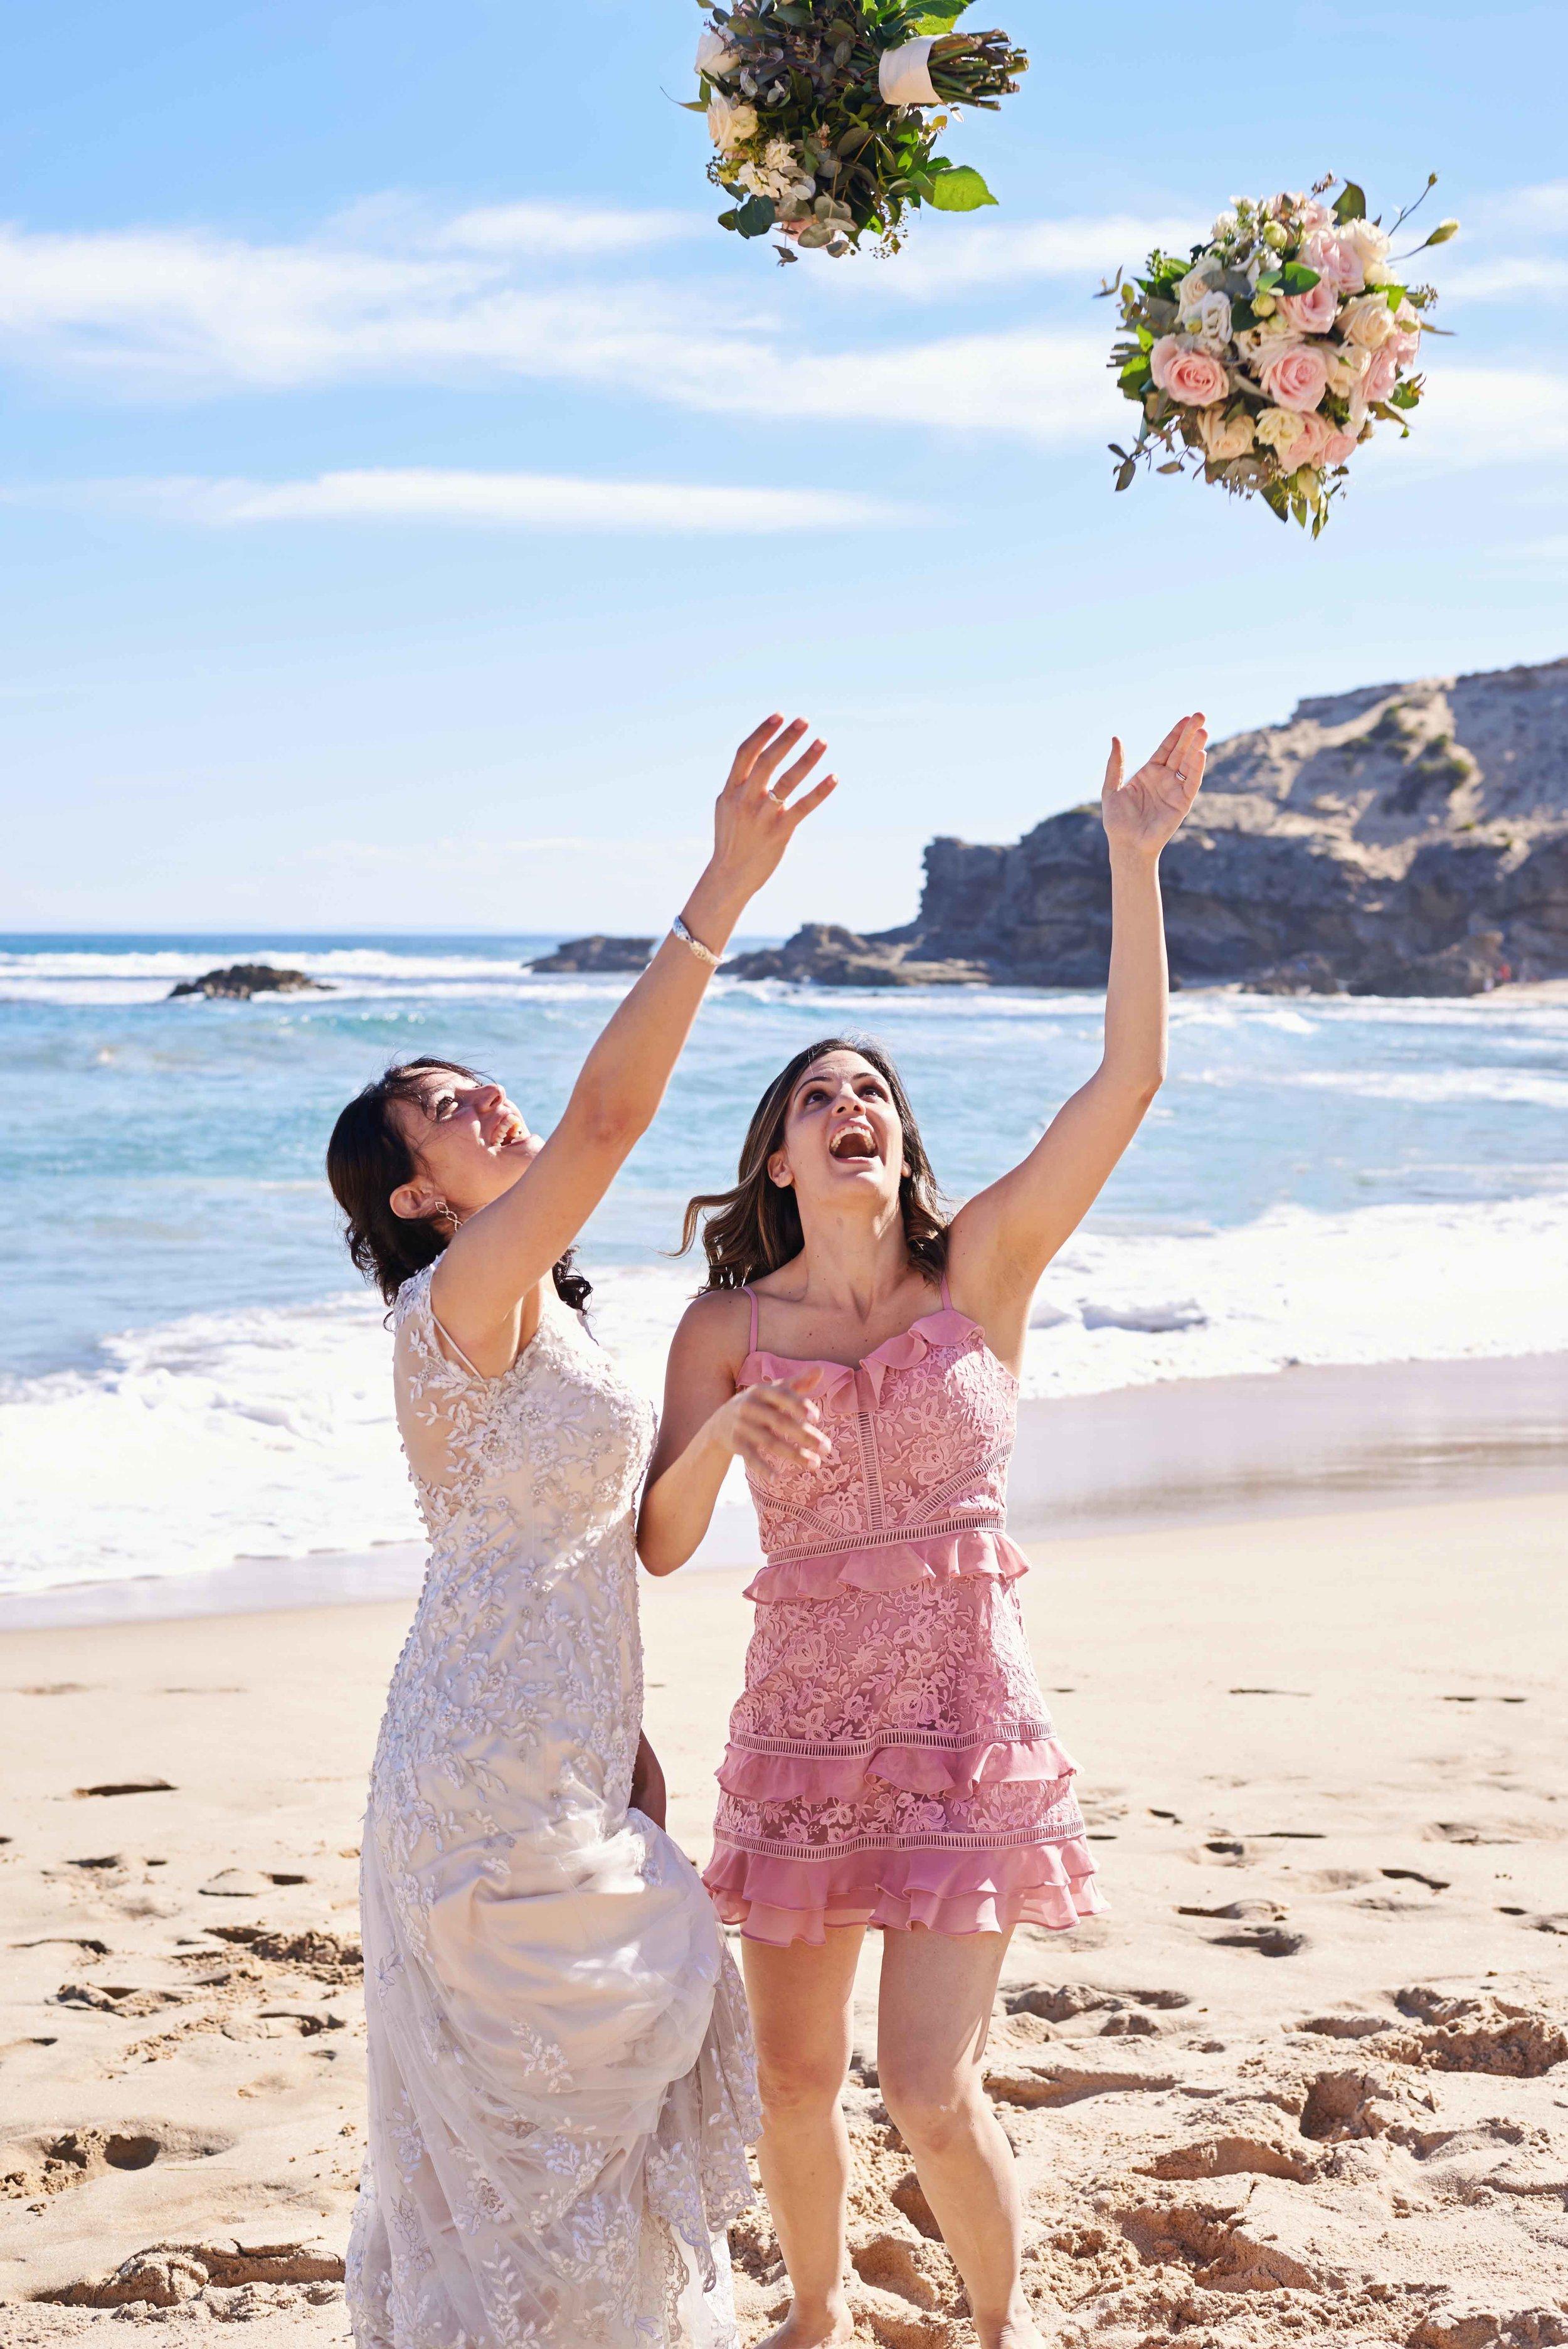 sorrento-wedding-photography-all-smiles-marissa-jade-photography-128.jpg